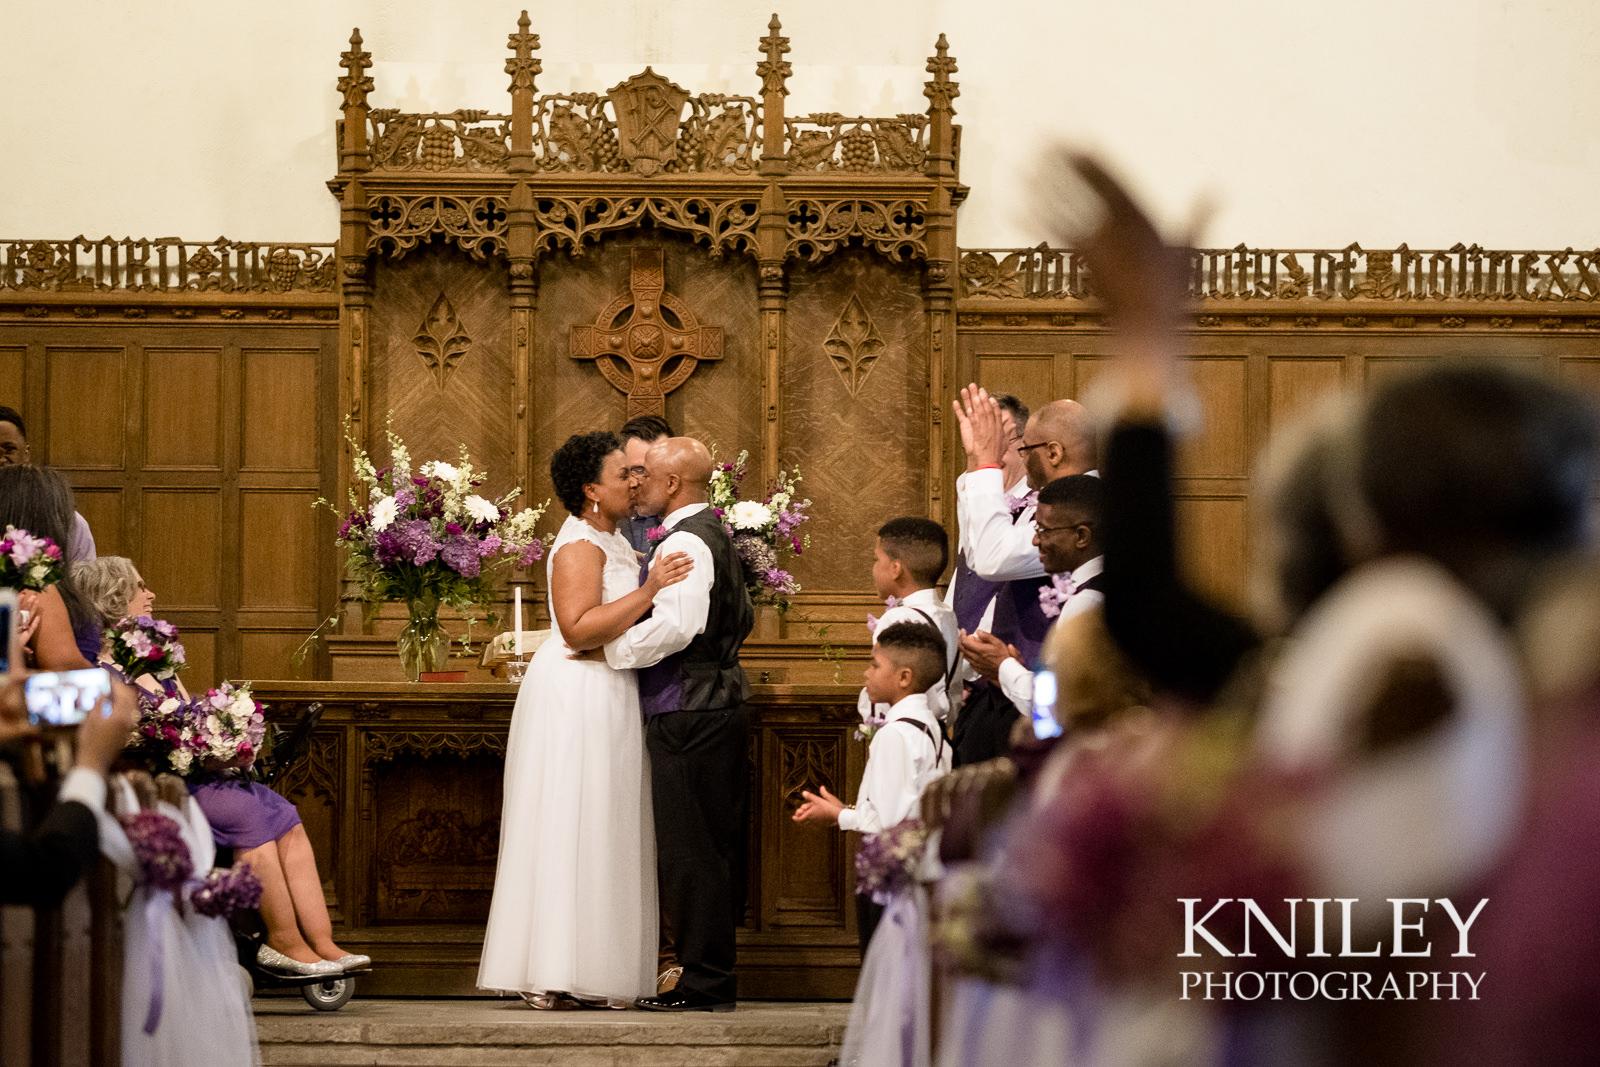 Rochester Colgate Divinity School Wedding - Classic Rochester NY Wedding - 028-XT2A4599.jpg